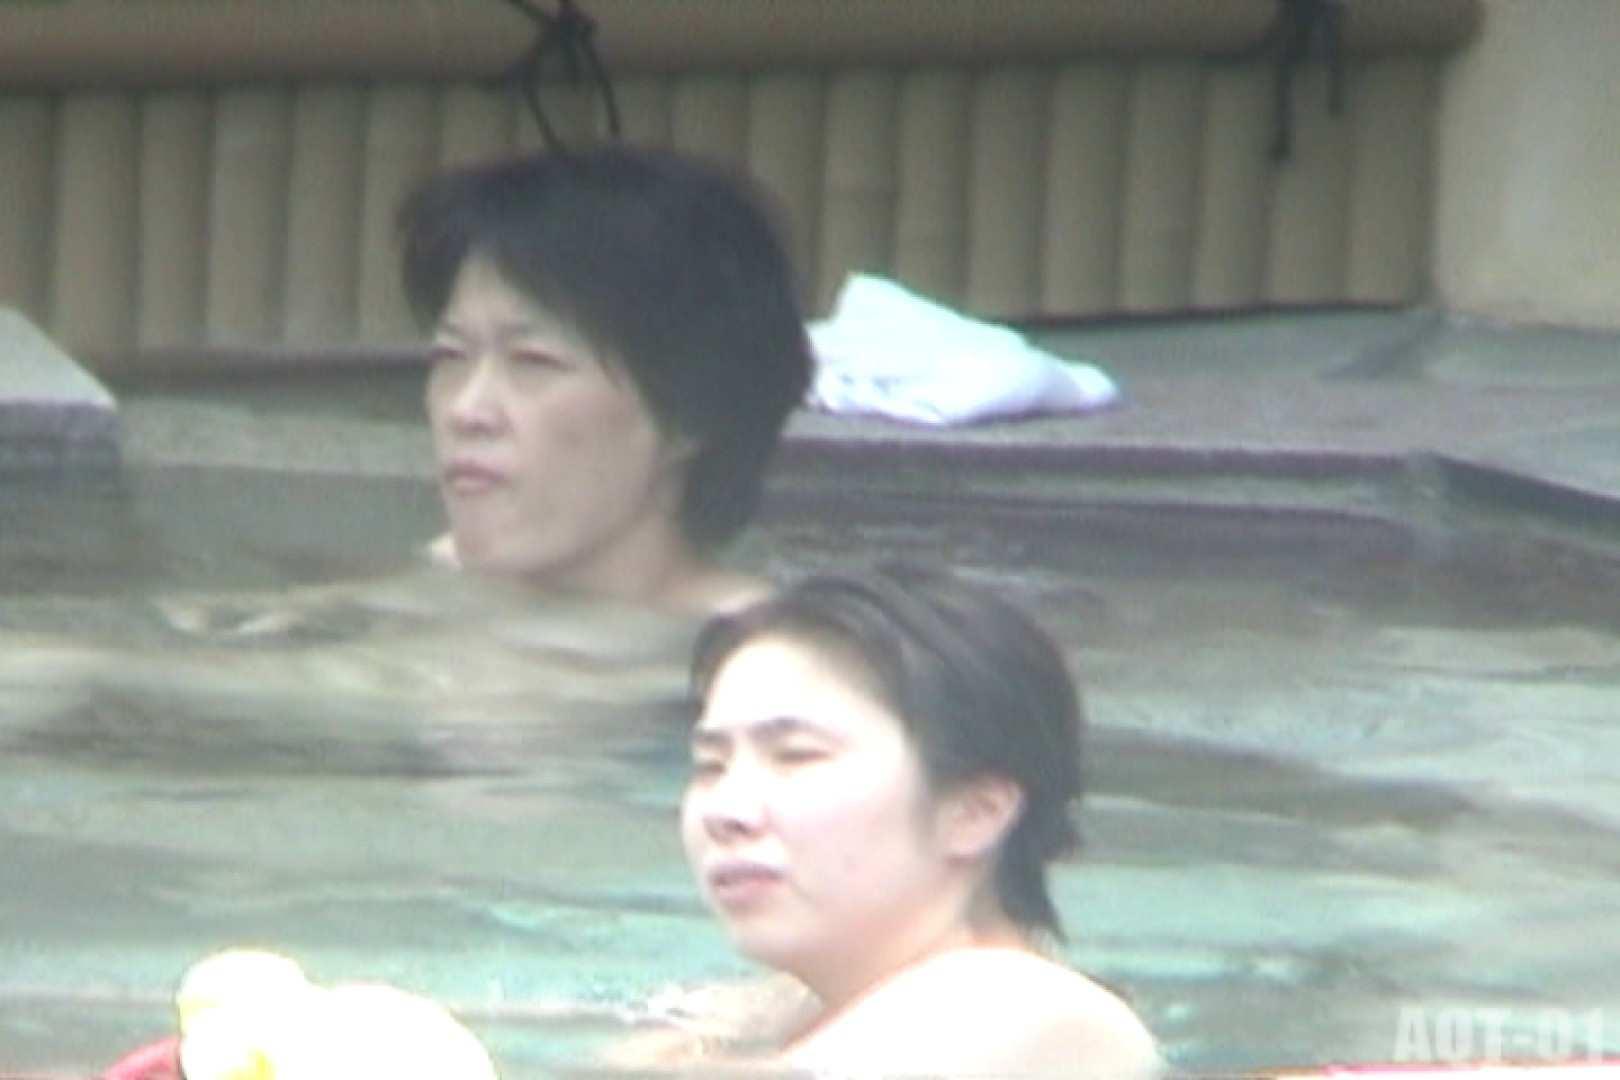 Aquaな露天風呂Vol.717 露天風呂編  111PIX 44